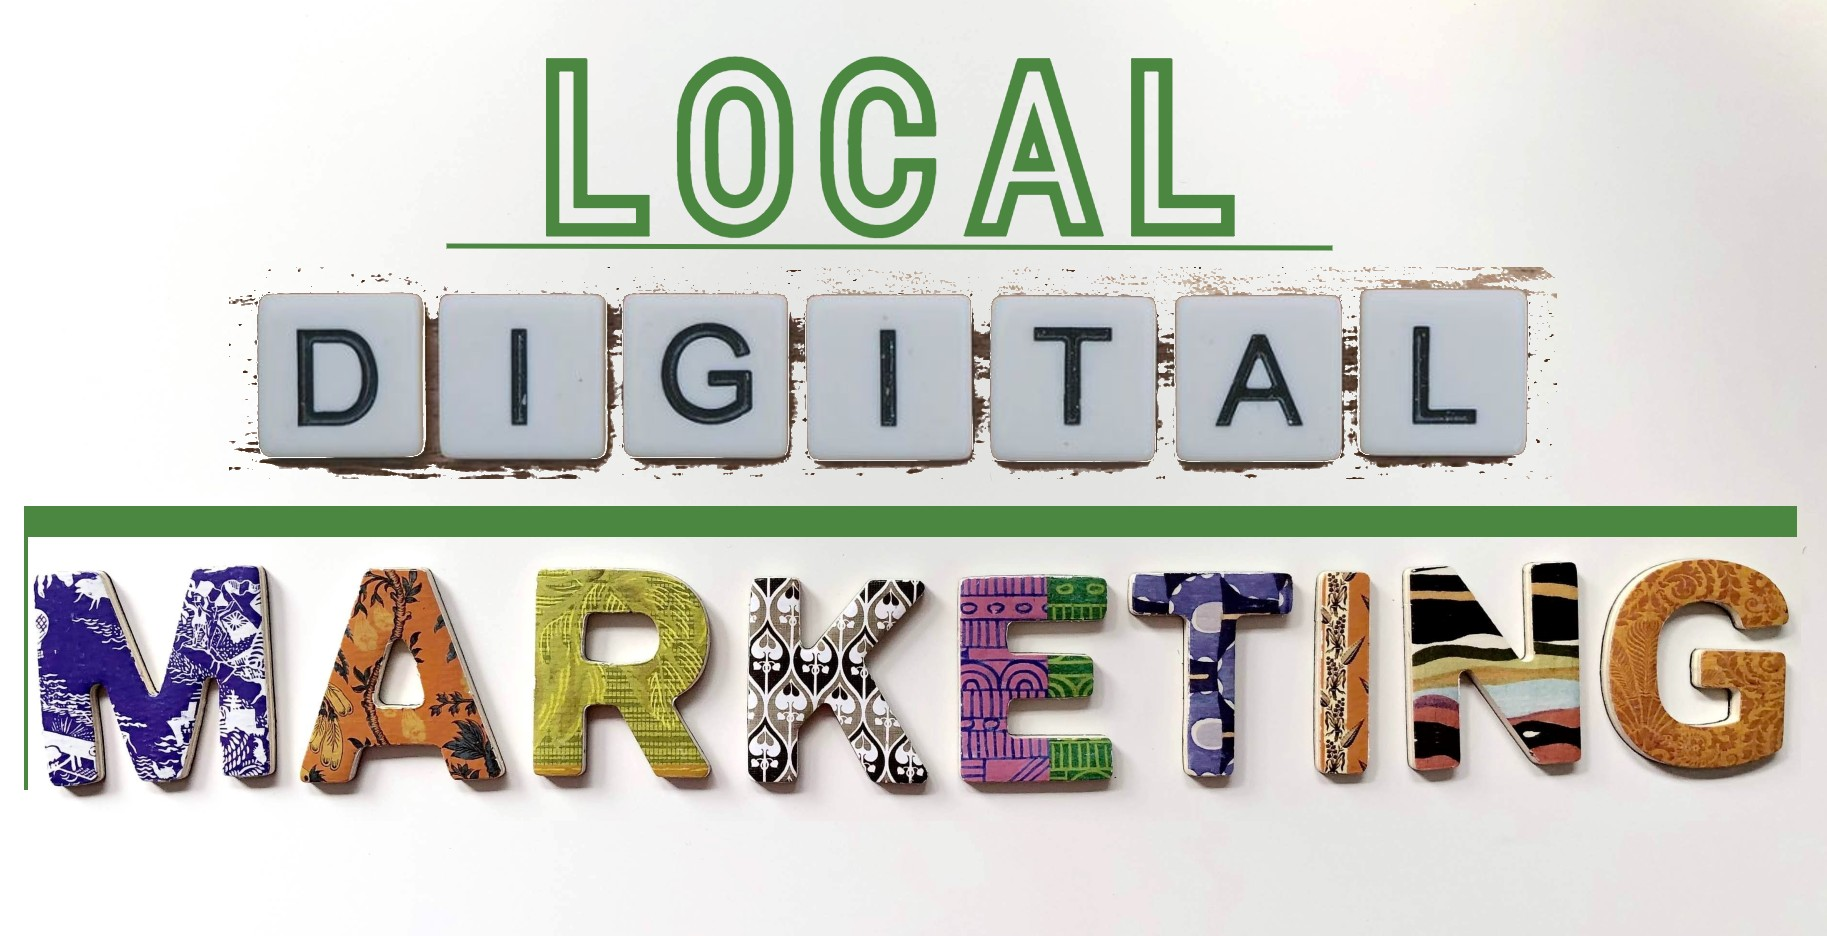 Northampton online advertising